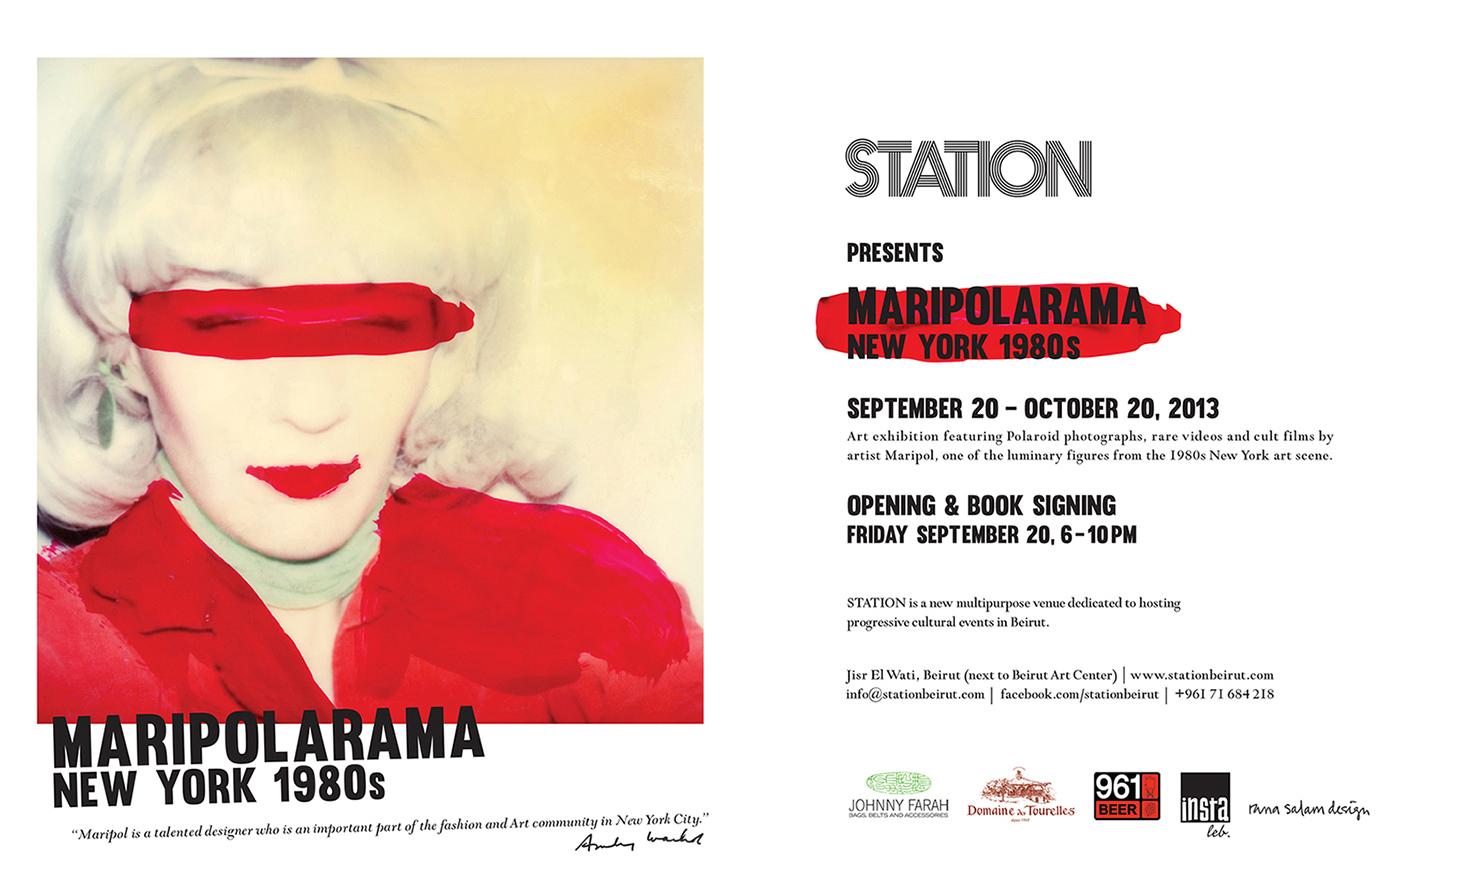 STATION - Maripolarama invite.jpg